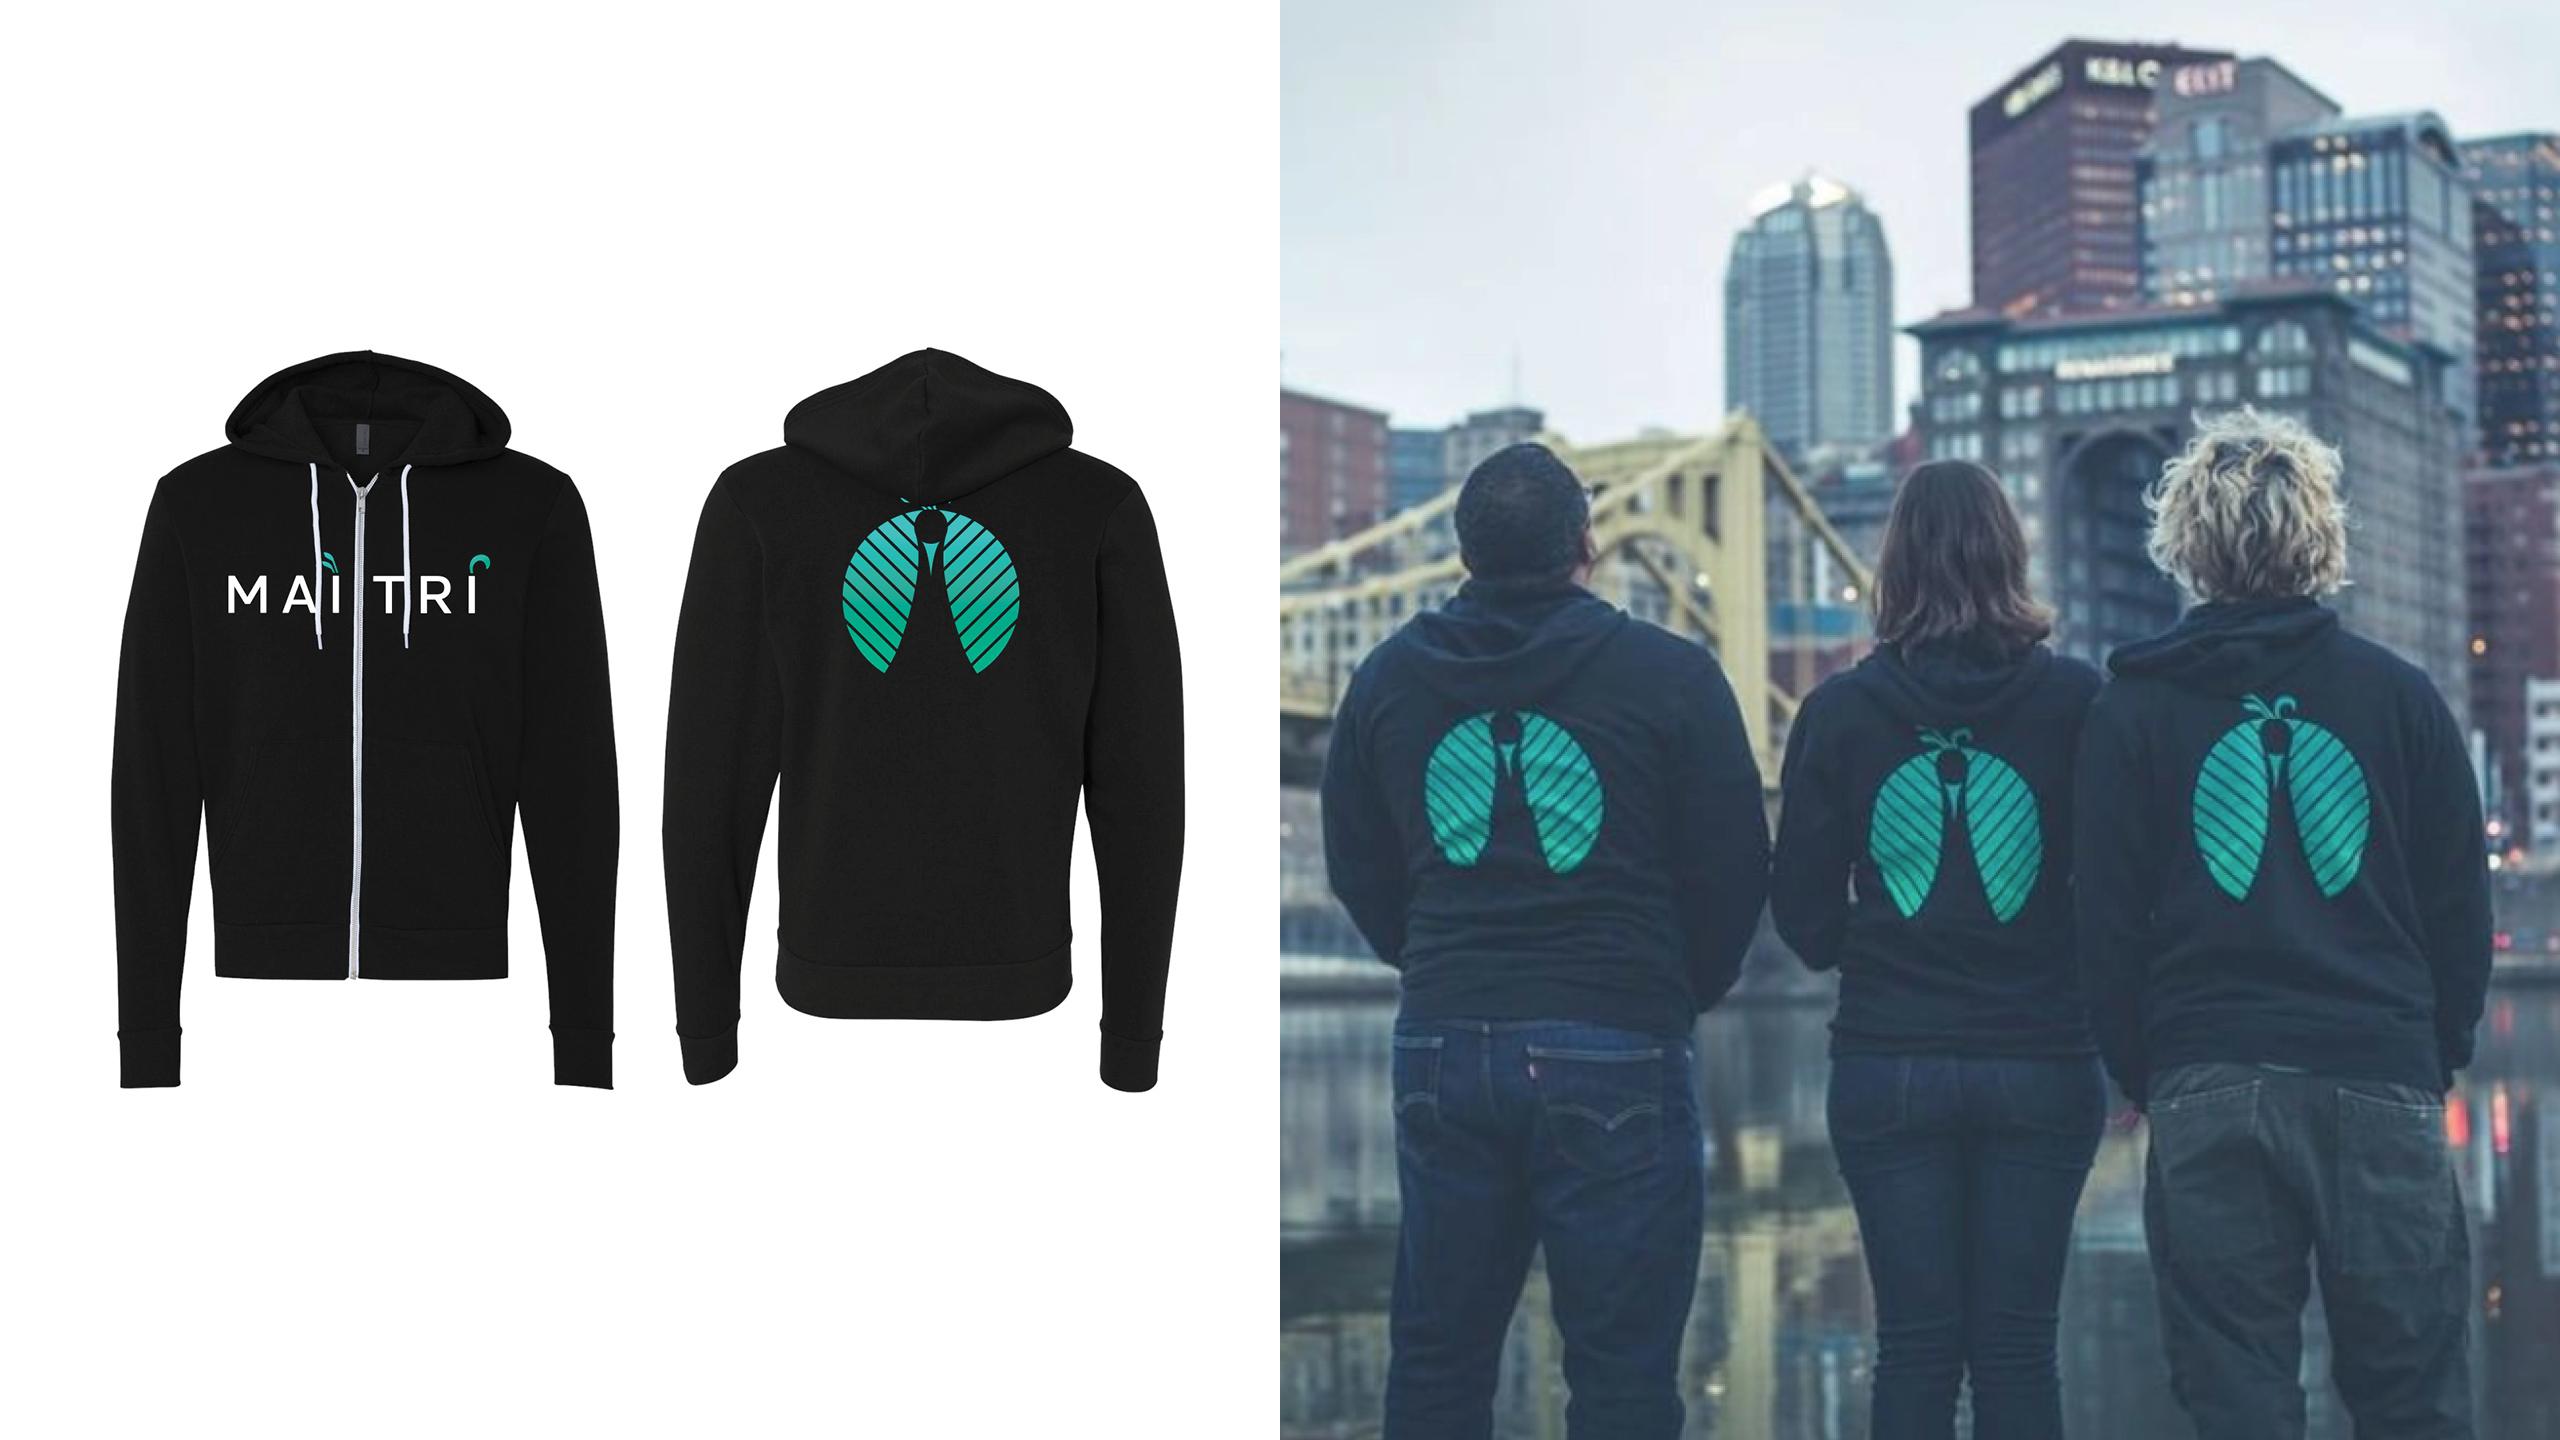 Maitri Medicinals Custom Sweatshirts by High Road Design Studio